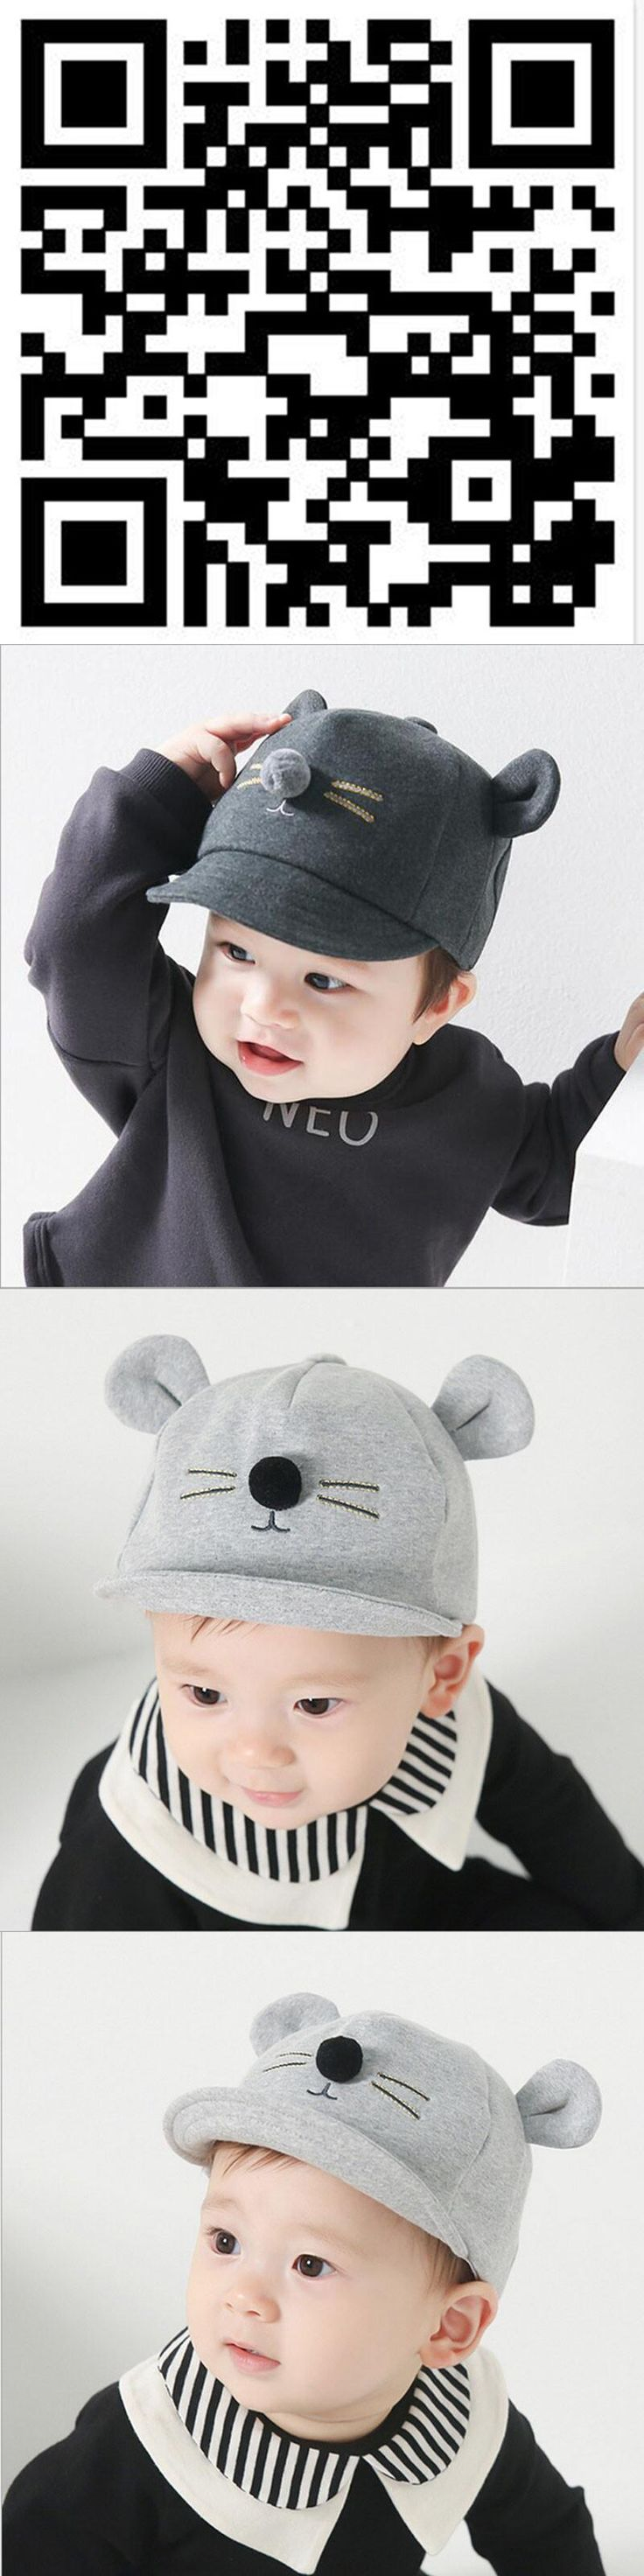 2017 new Cute Baby Cartoon Cat Hat Kids Baseball Cap Palm Newborn Infant Boy Girl Soft Cotton Caps Infant Sun Hat free shipping